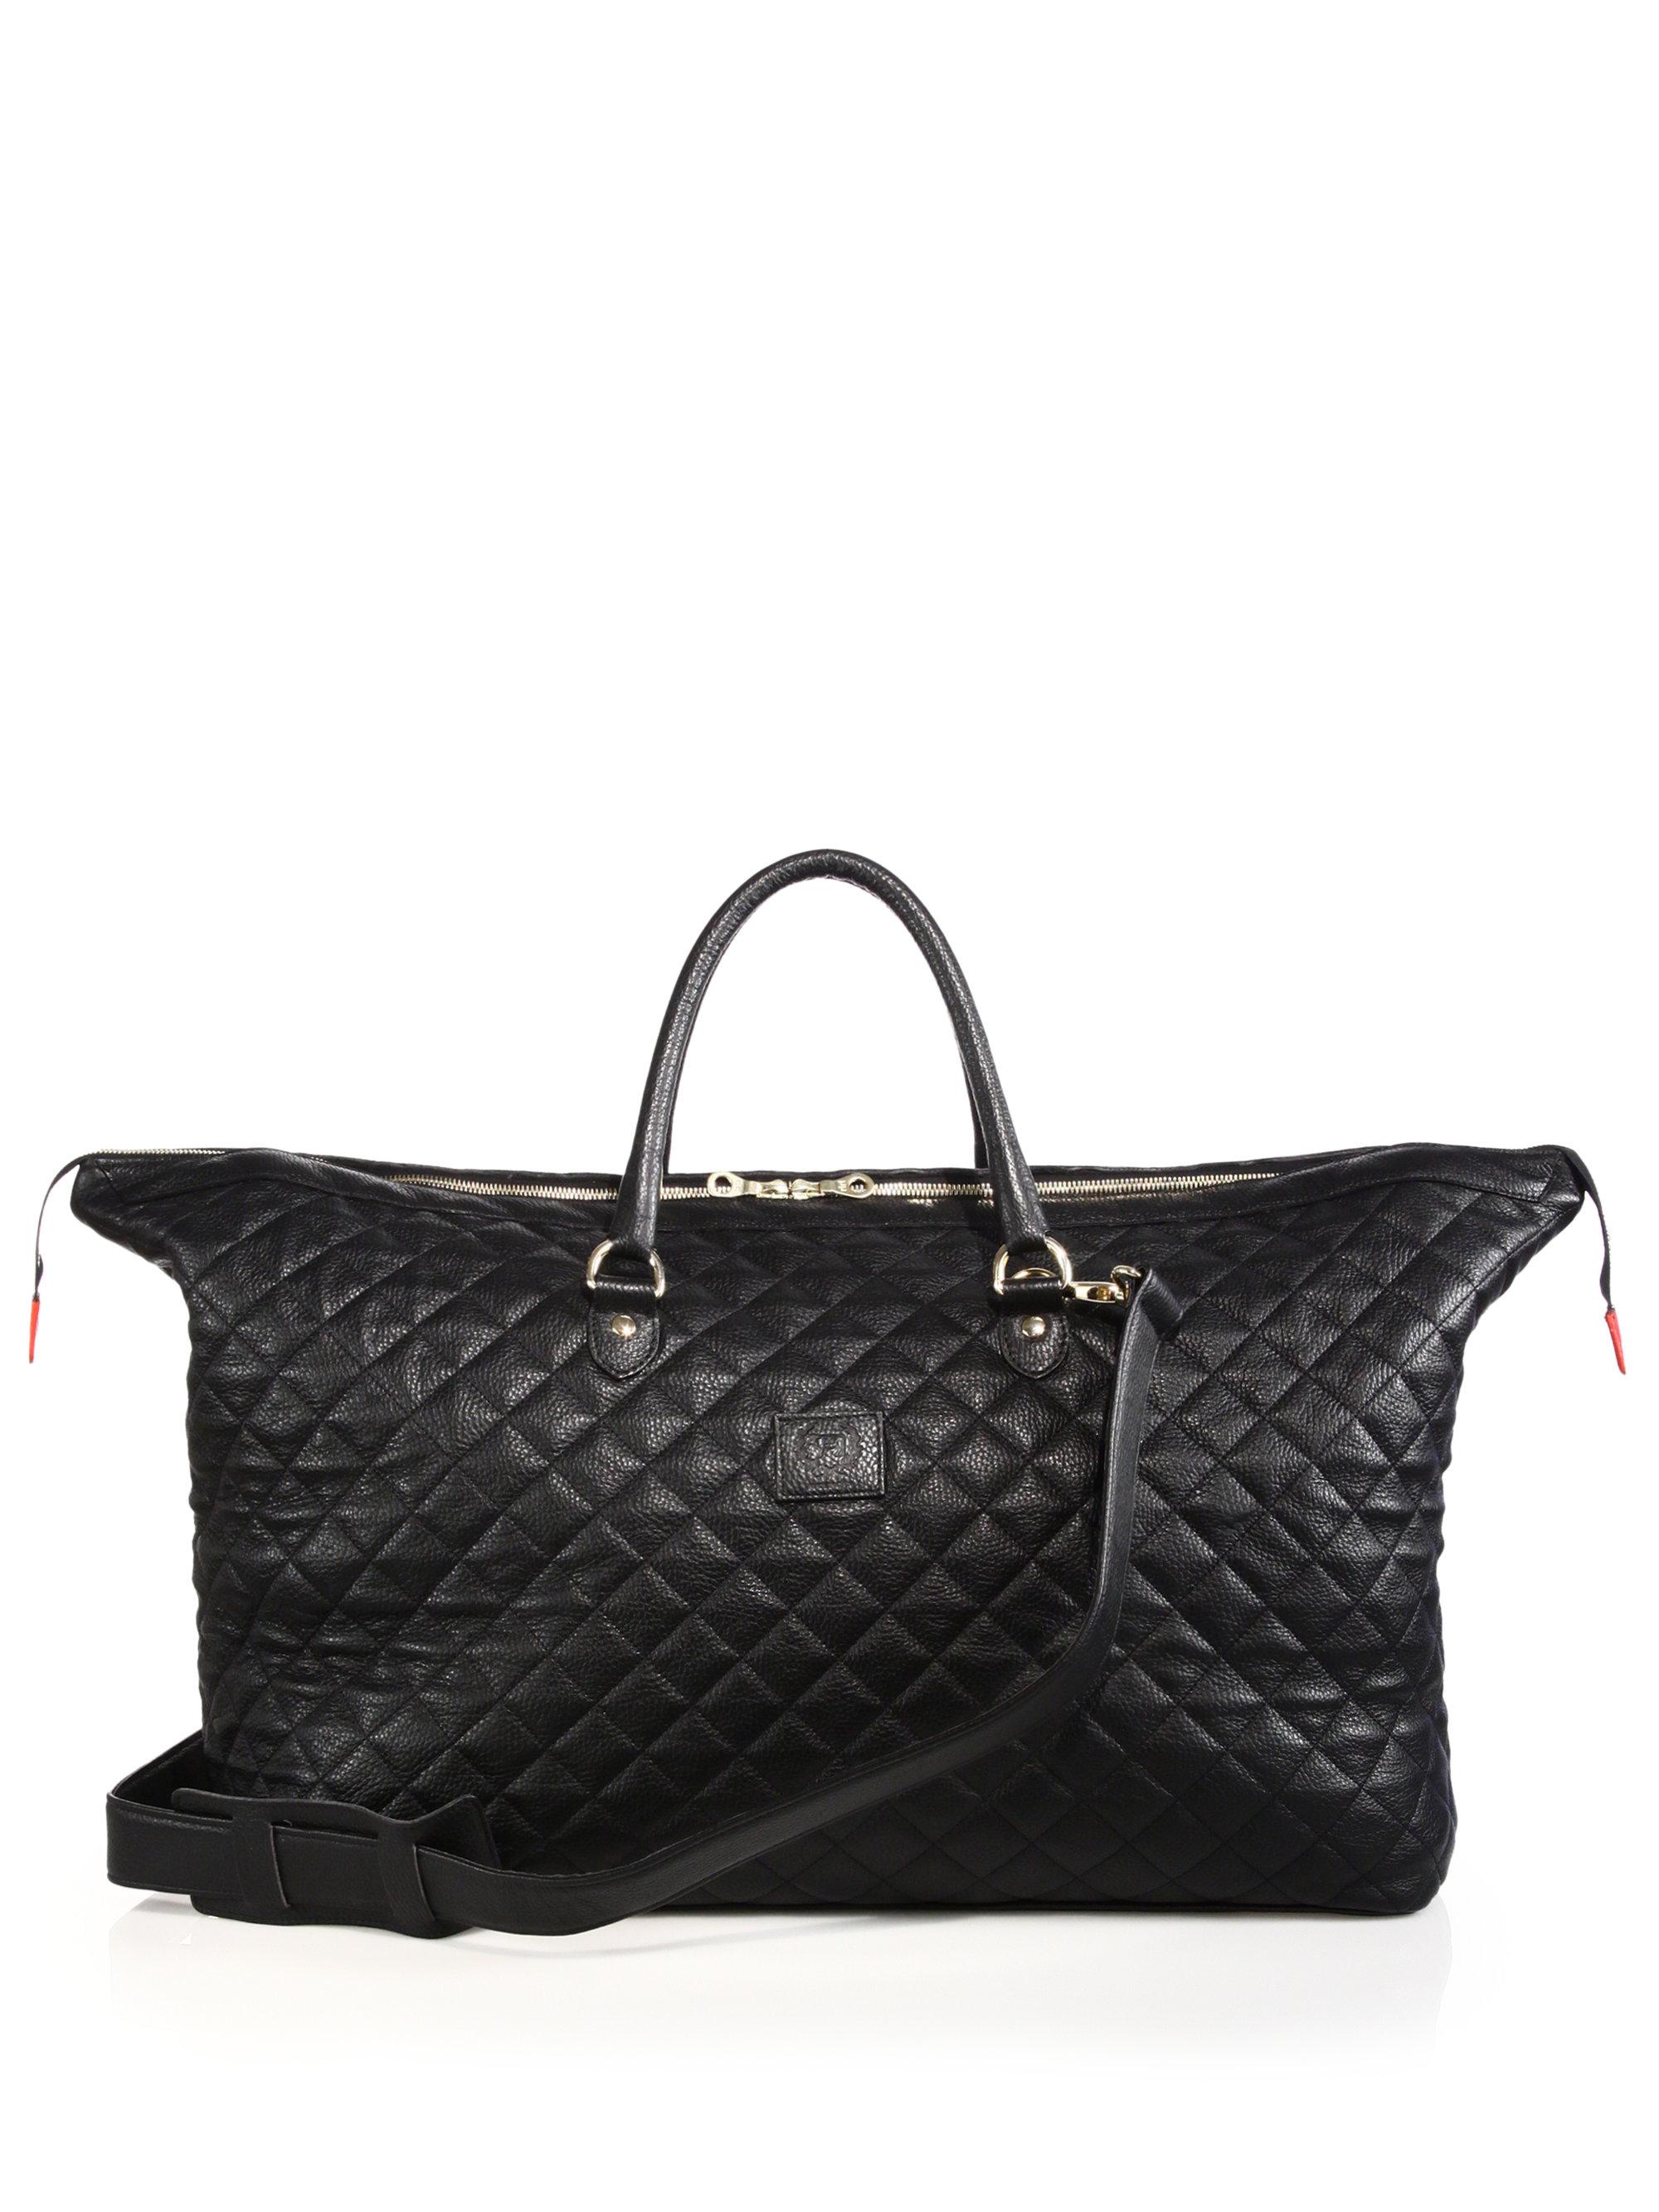 Lyst Del Toro Quilted Leather Weekender Bag In Black For Men